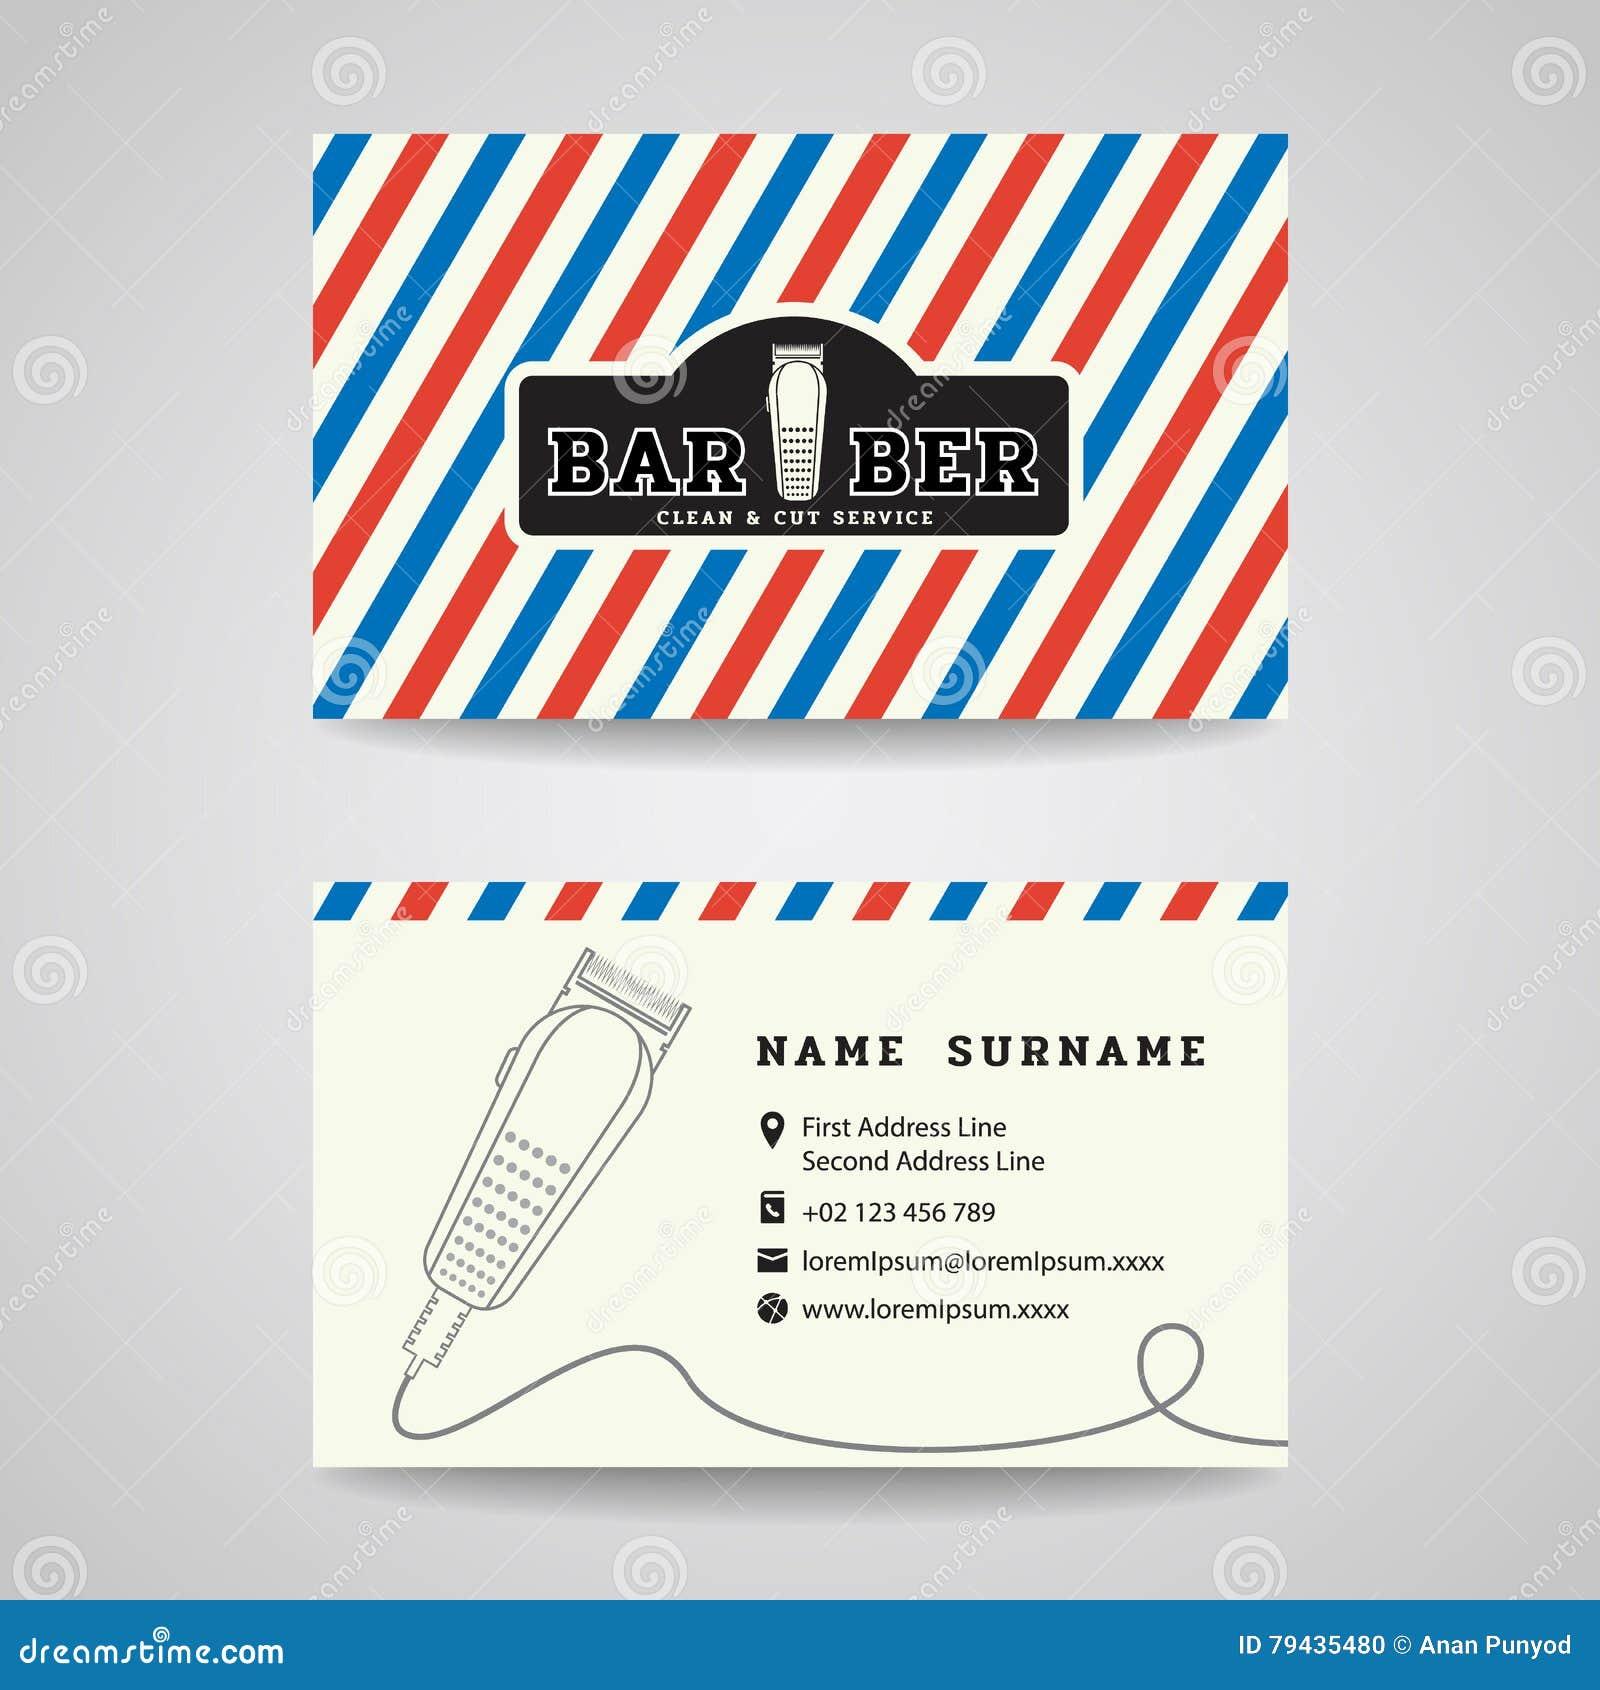 barber logos business cards - photo #11